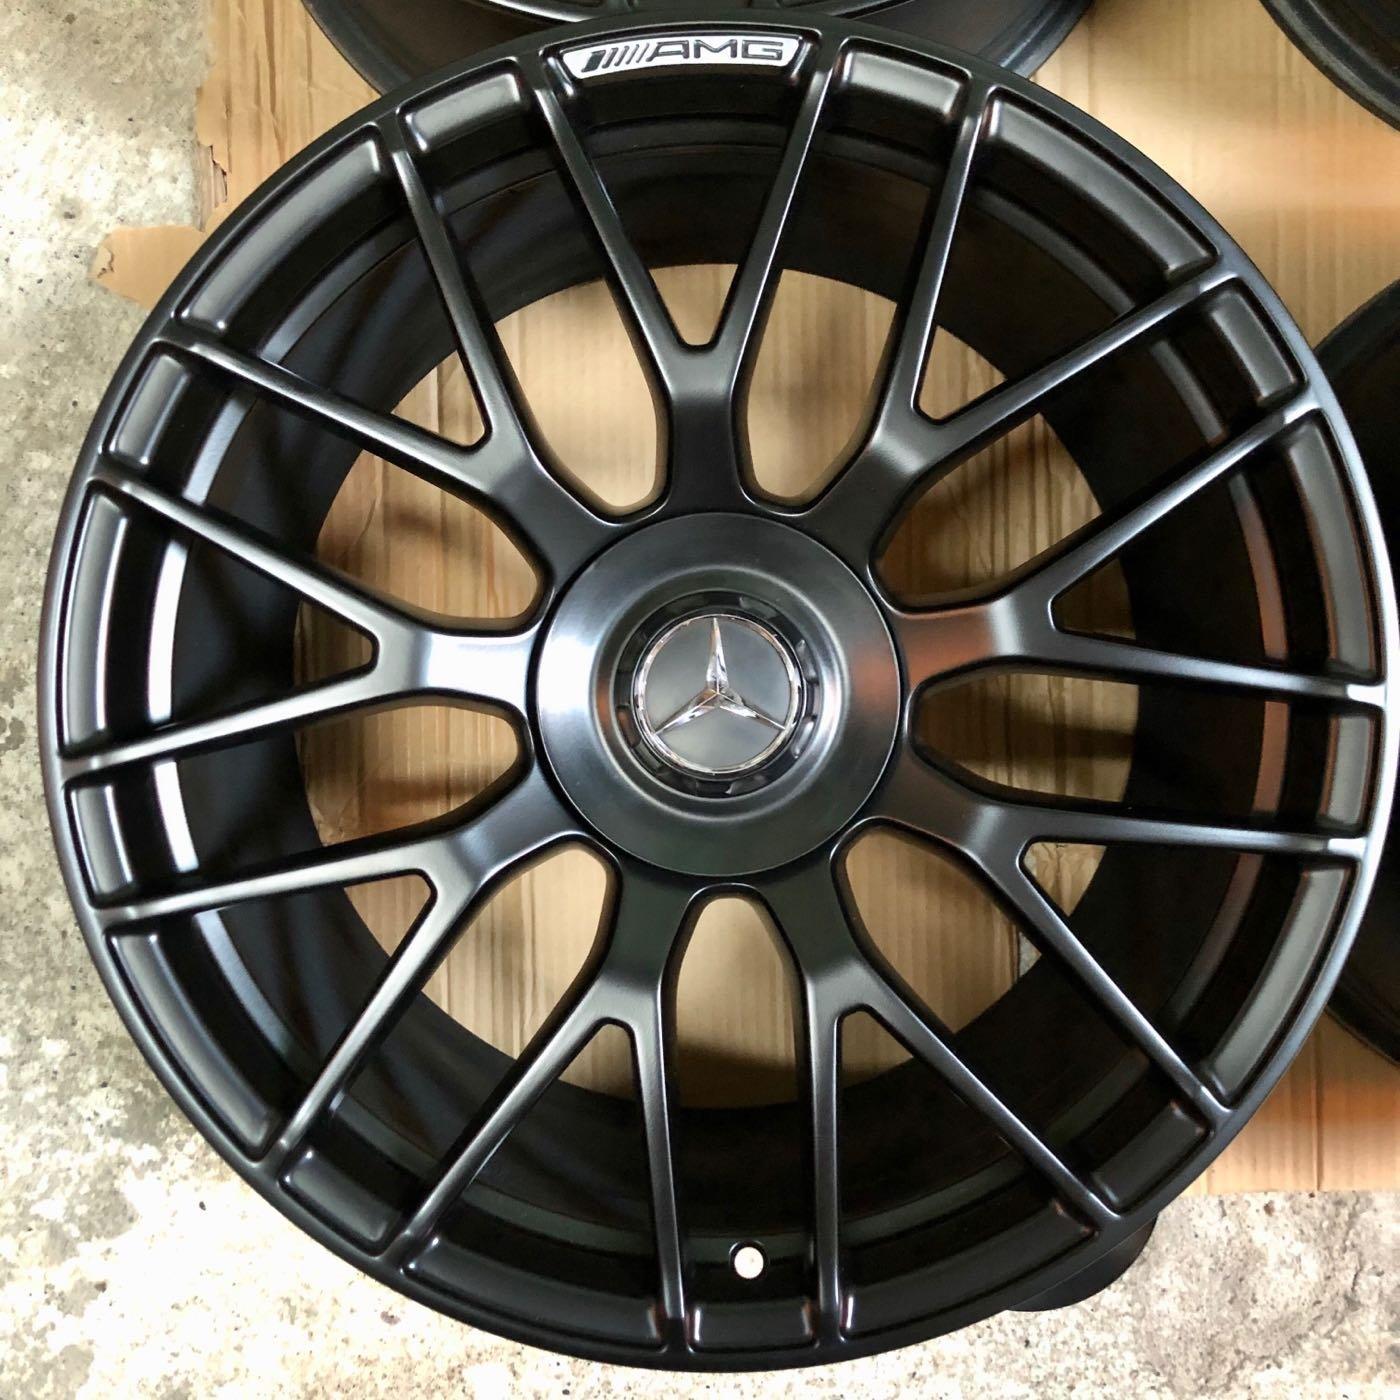 賓士2017 CLS63 S AMG ED1 四輪驅動正原廠 edition1 19吋鍛造鋁圈